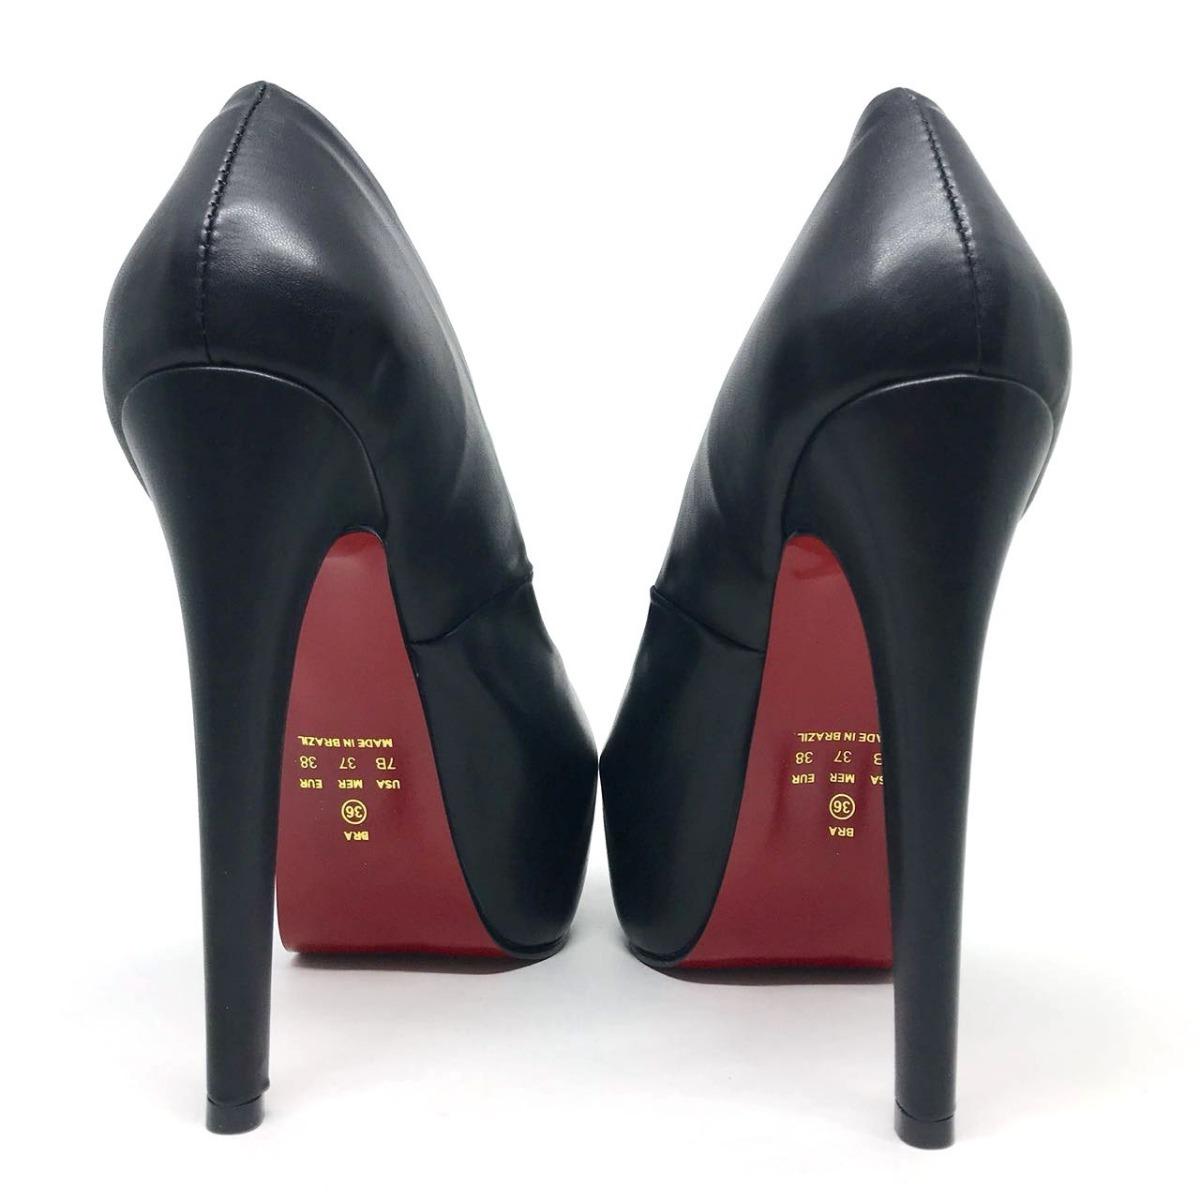 39a62f868 sapato scarpin meia pata preto salto alto fino festa eventos. Carregando  zoom.